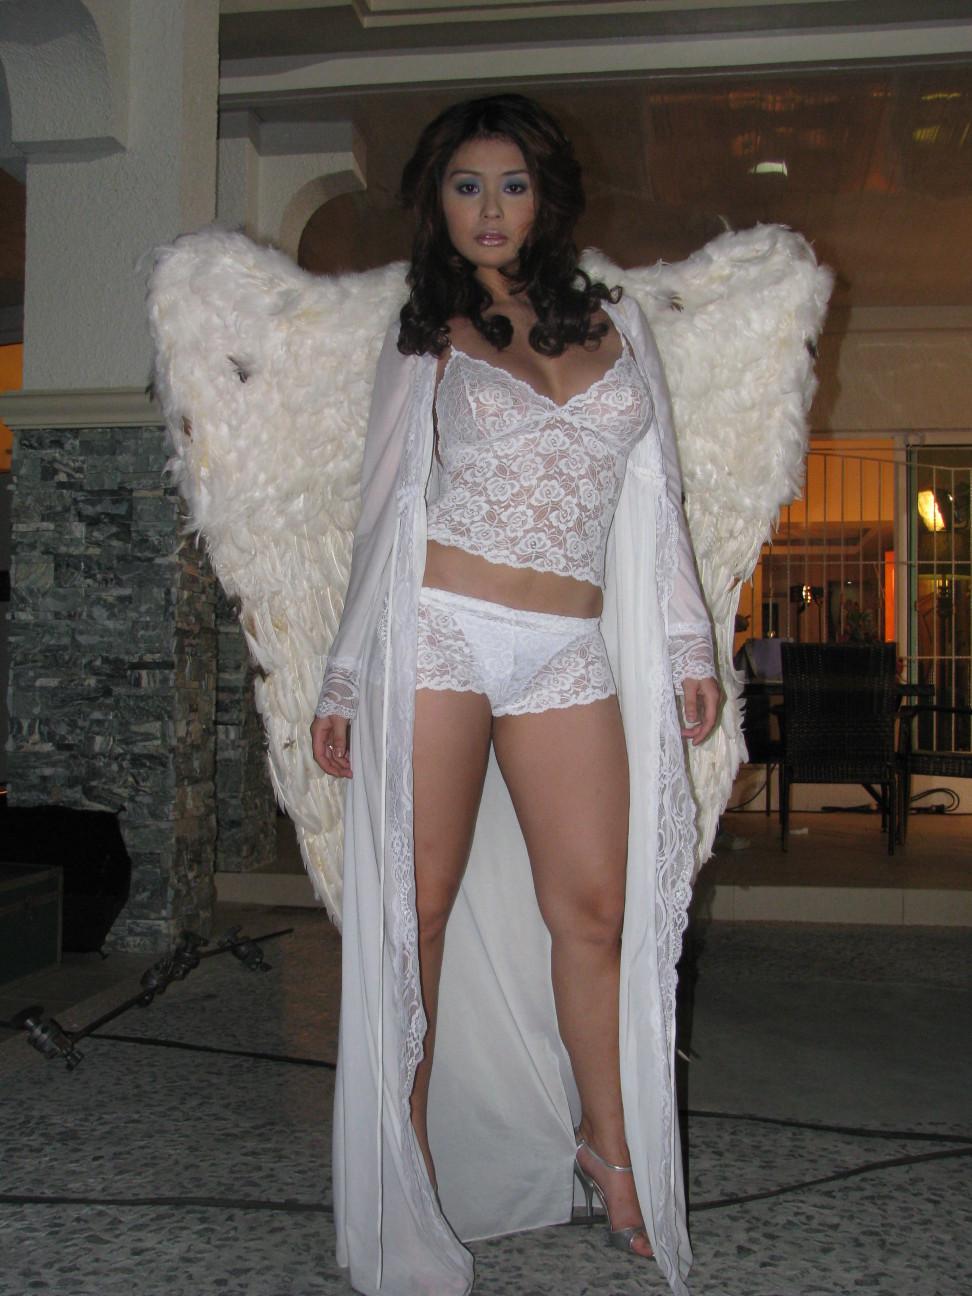 iwa moto sexy fhm lingerie pics 02